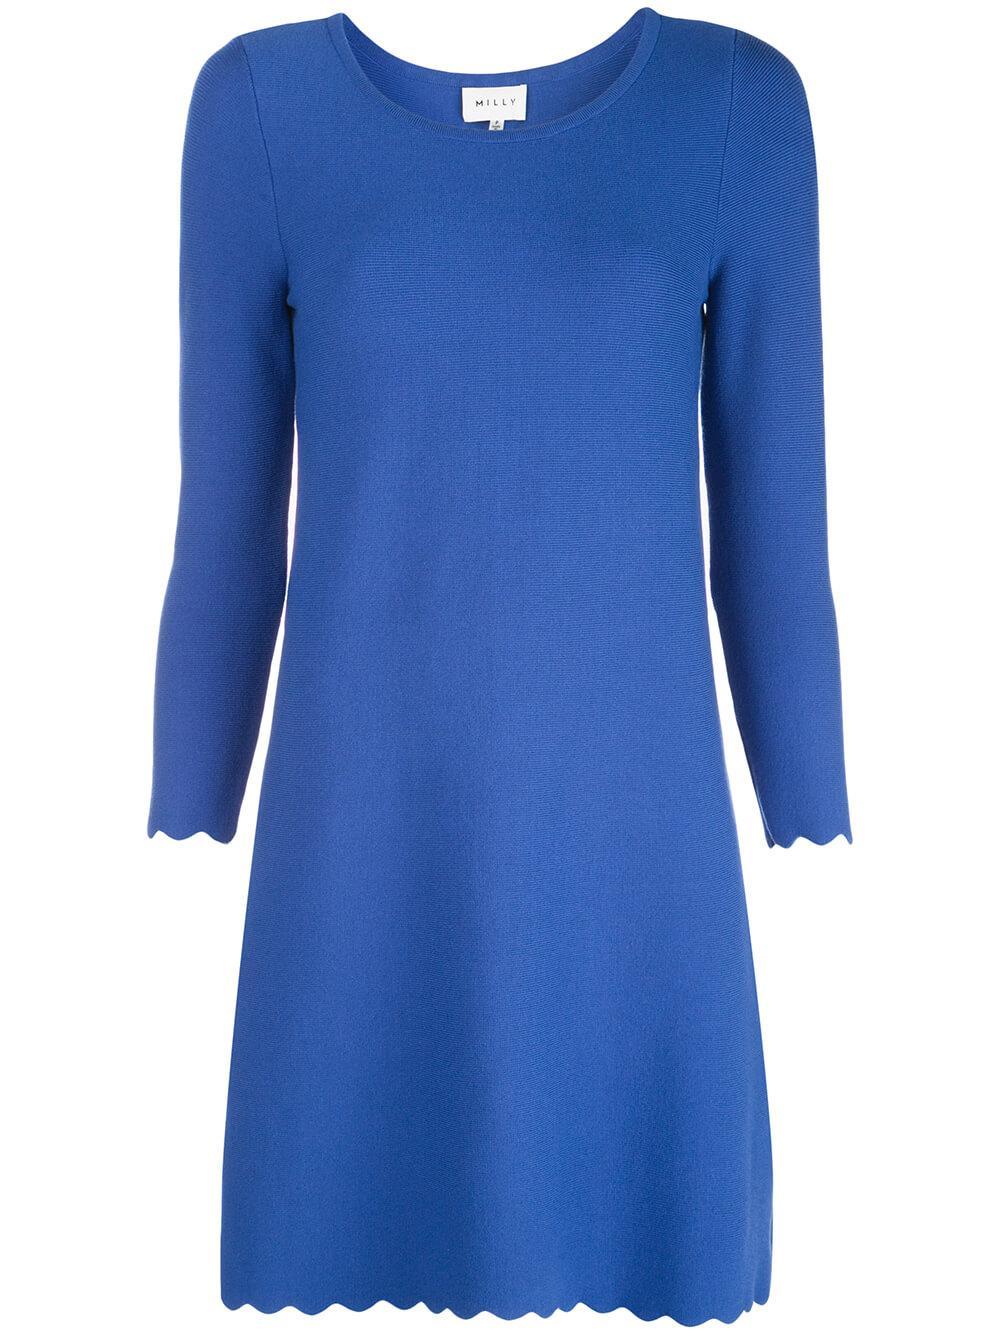 Scallop A Line 3/4 Sleeve Dress